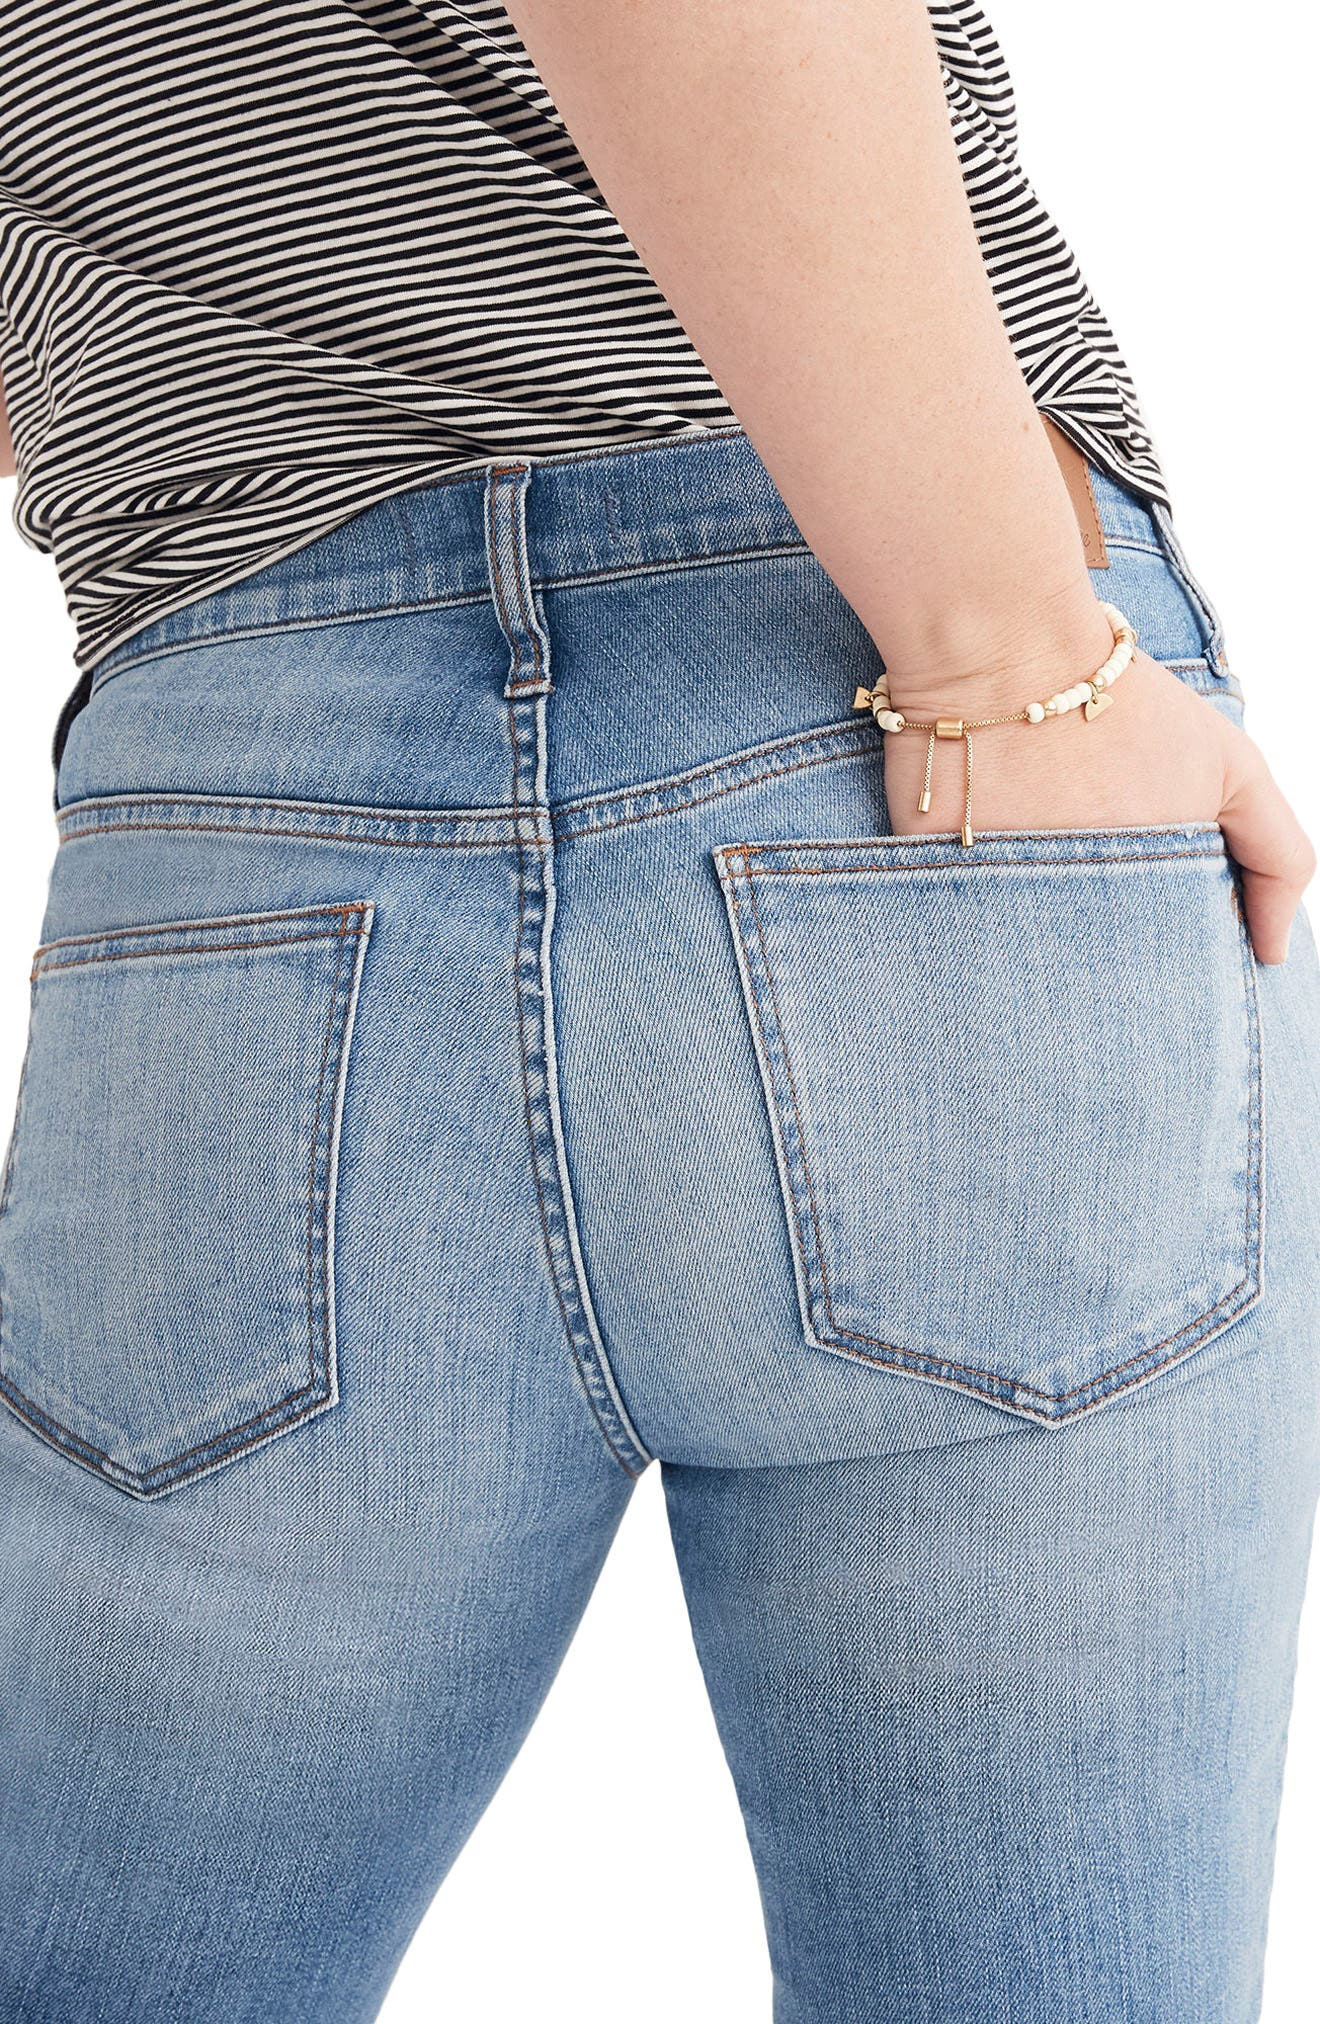 MADEWELL, 9-Inch High Waist Seamed Step-Hem Edition Skinny Jeans, Alternate thumbnail 3, color, 400